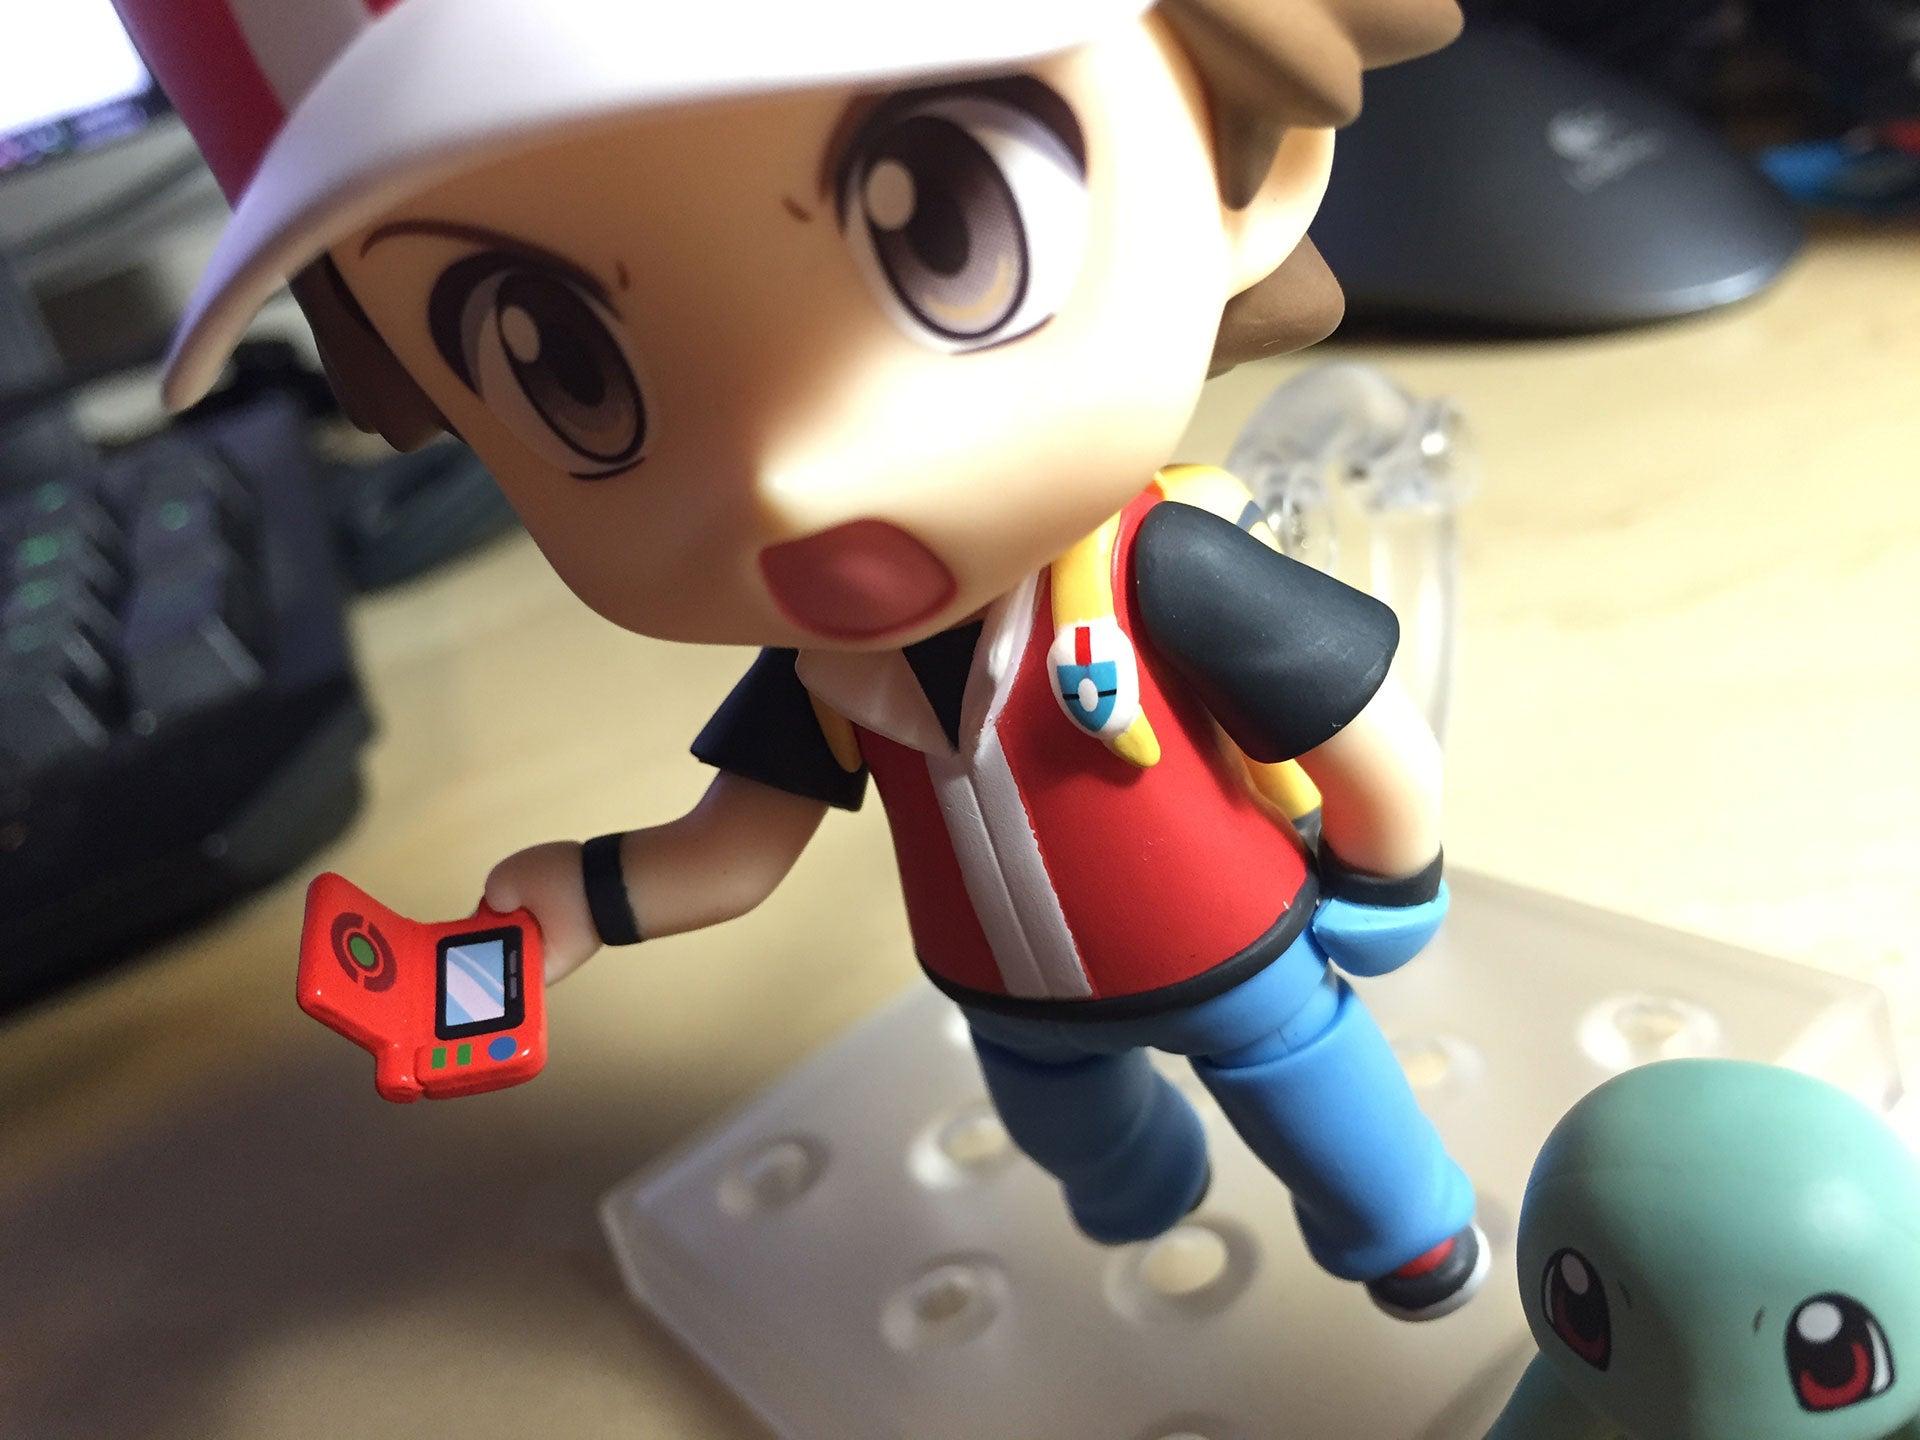 Nendoroid Pokémon Trainer Red: The Kotaku Review